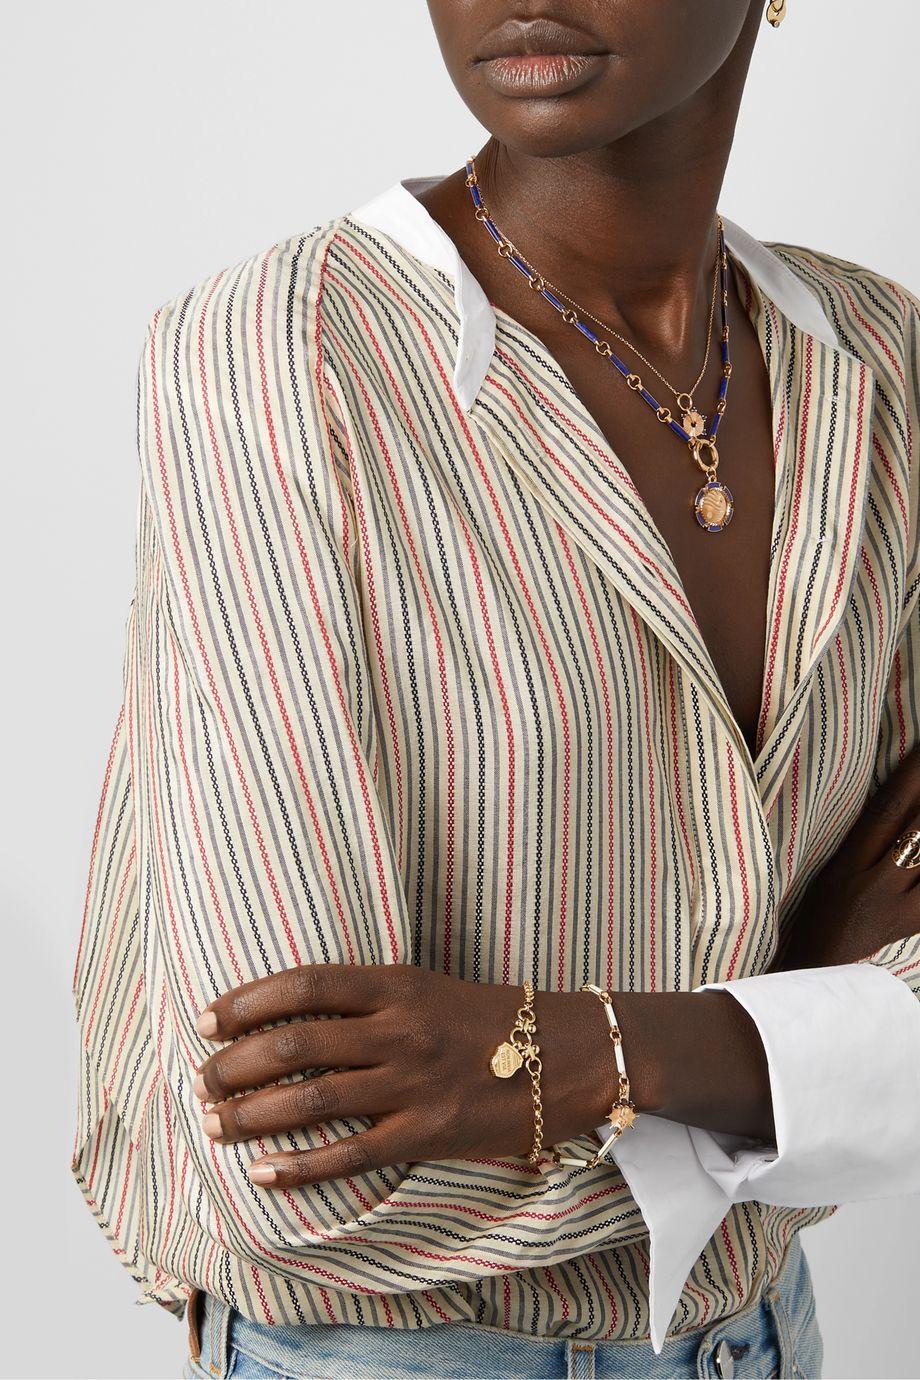 Foundrae Non Invia Est Via 18-karat gold bracelet